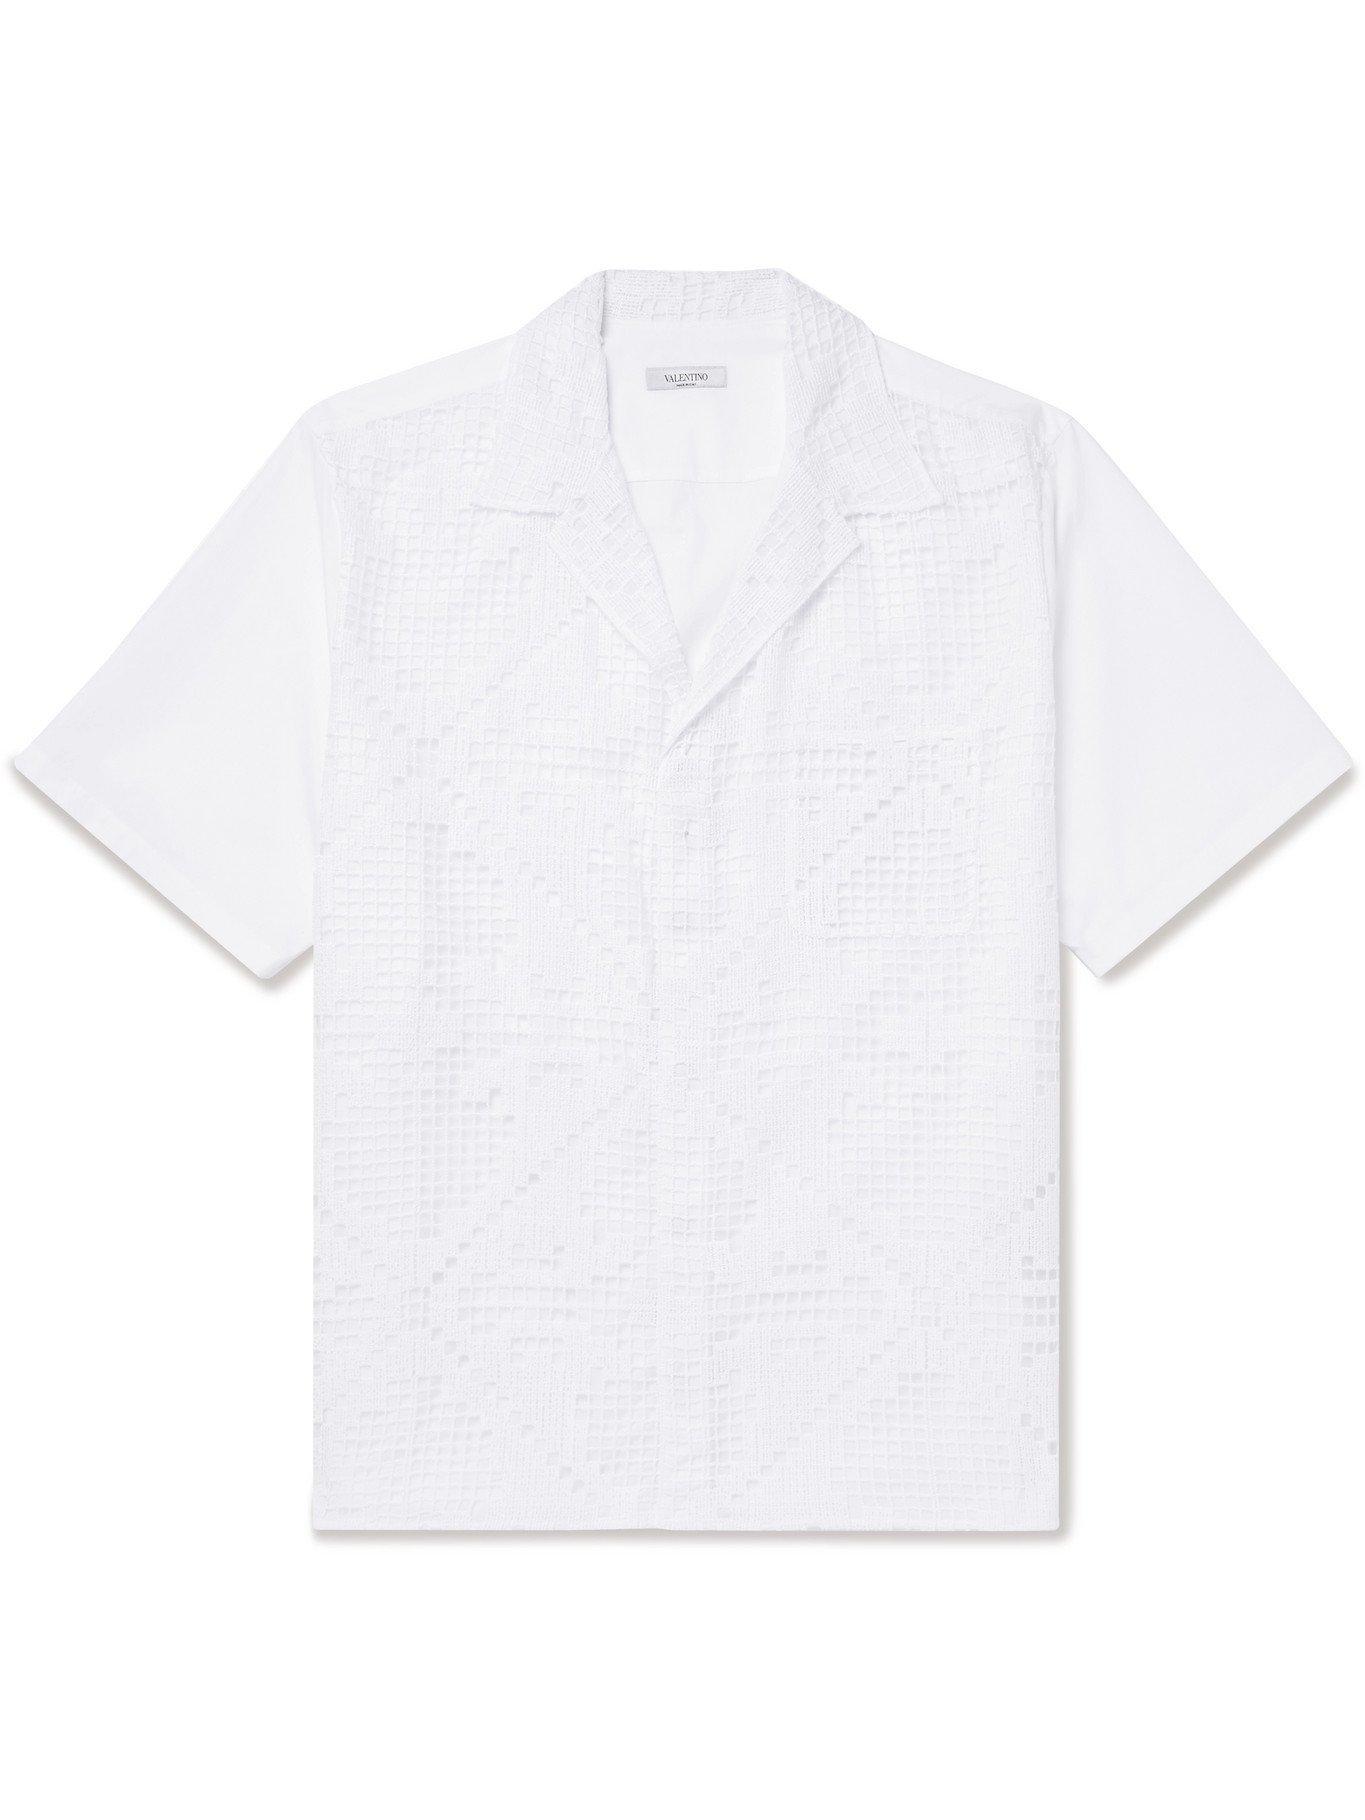 Photo: VALENTINO - Camp-Collar Macramé Lace and Cotton-Poplin Shirt - White - IT 46